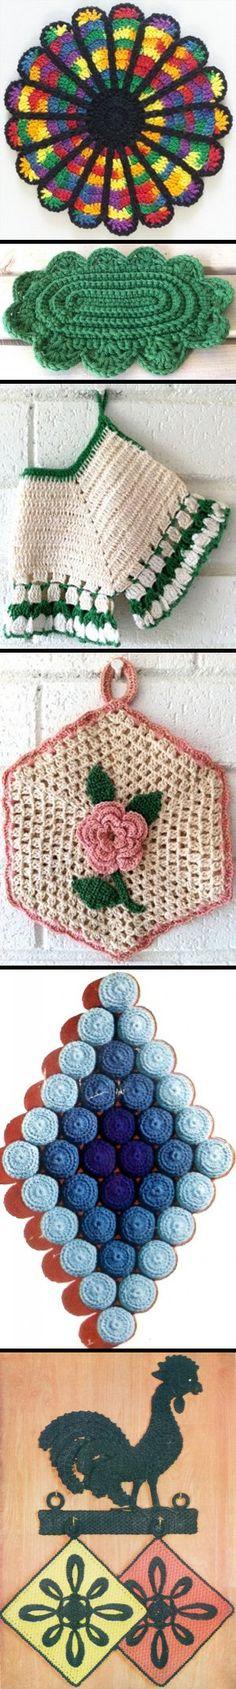 Several potholder and hotplate crochet patterns